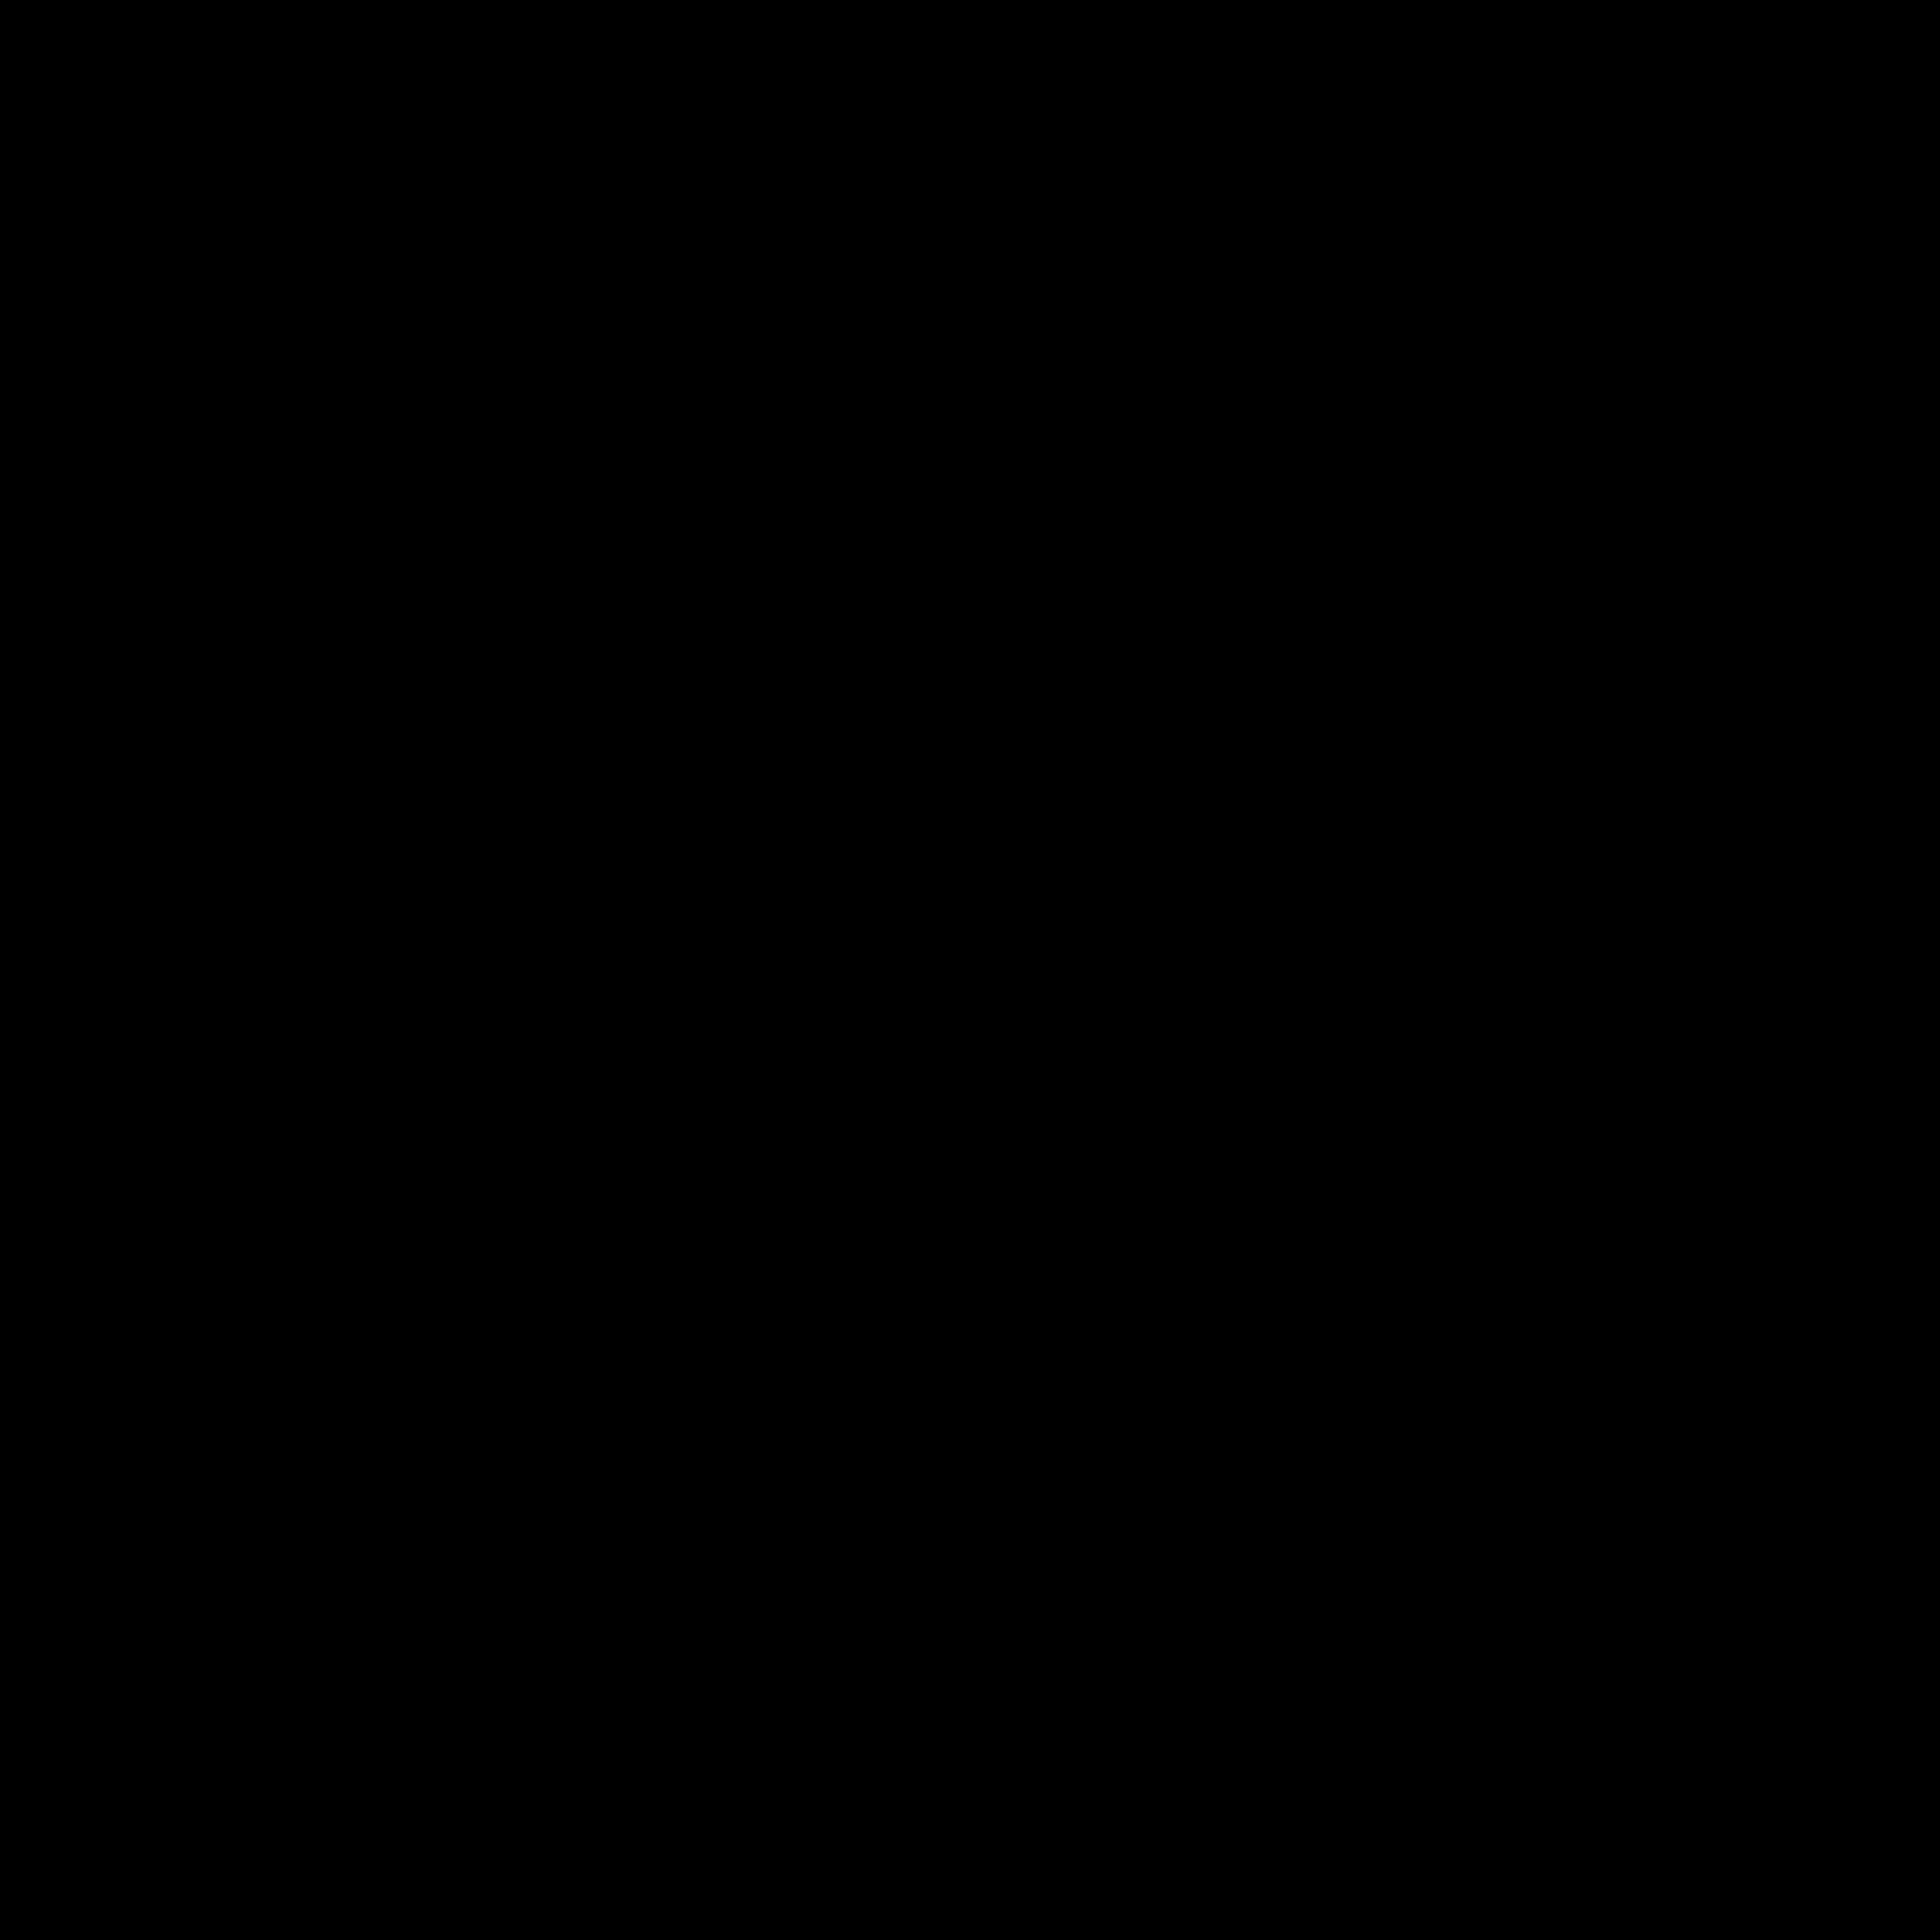 UNDP Logo PNG Transparent & SVG Vector.